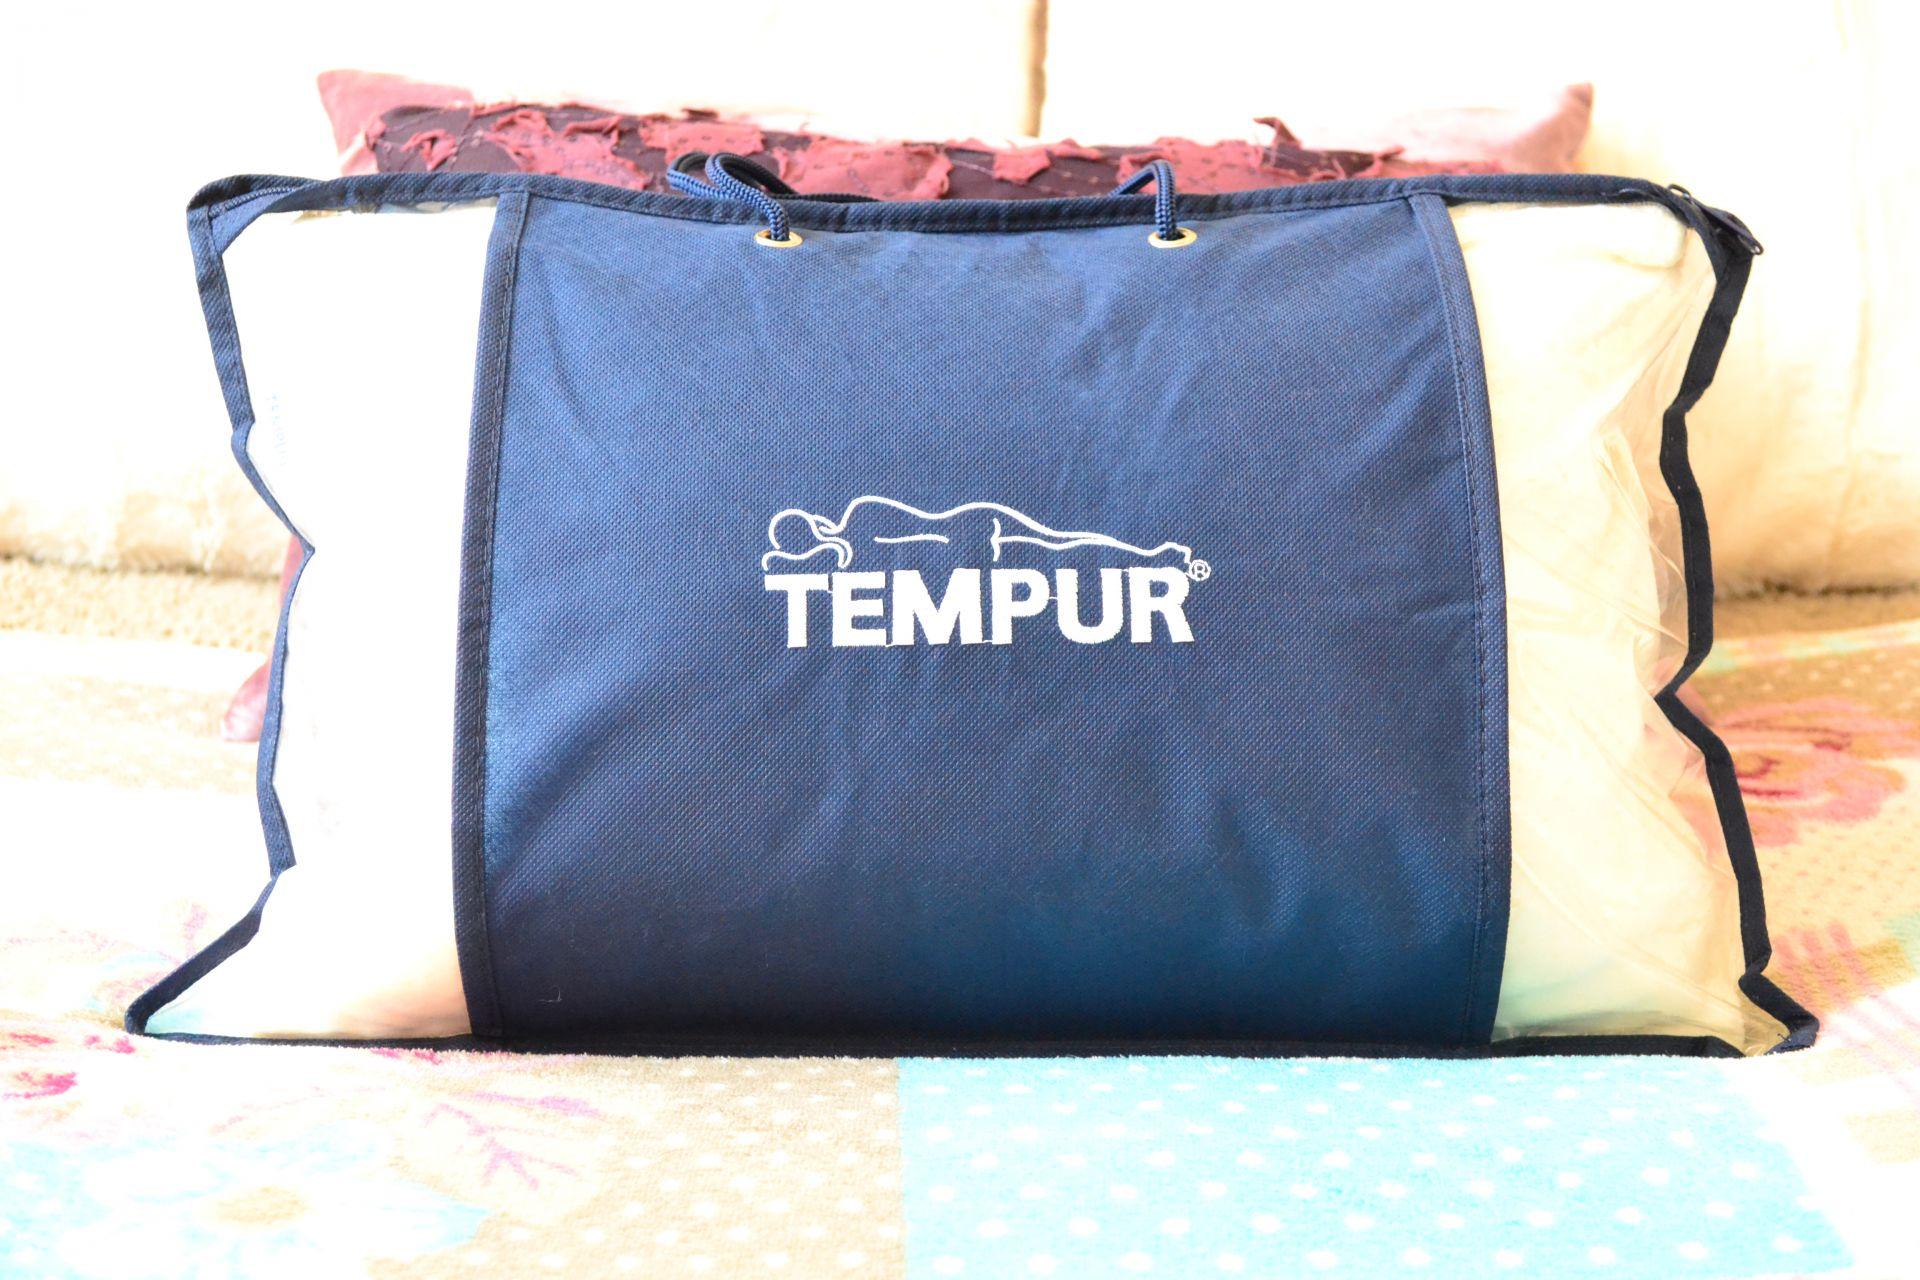 tempur-travel-pillow